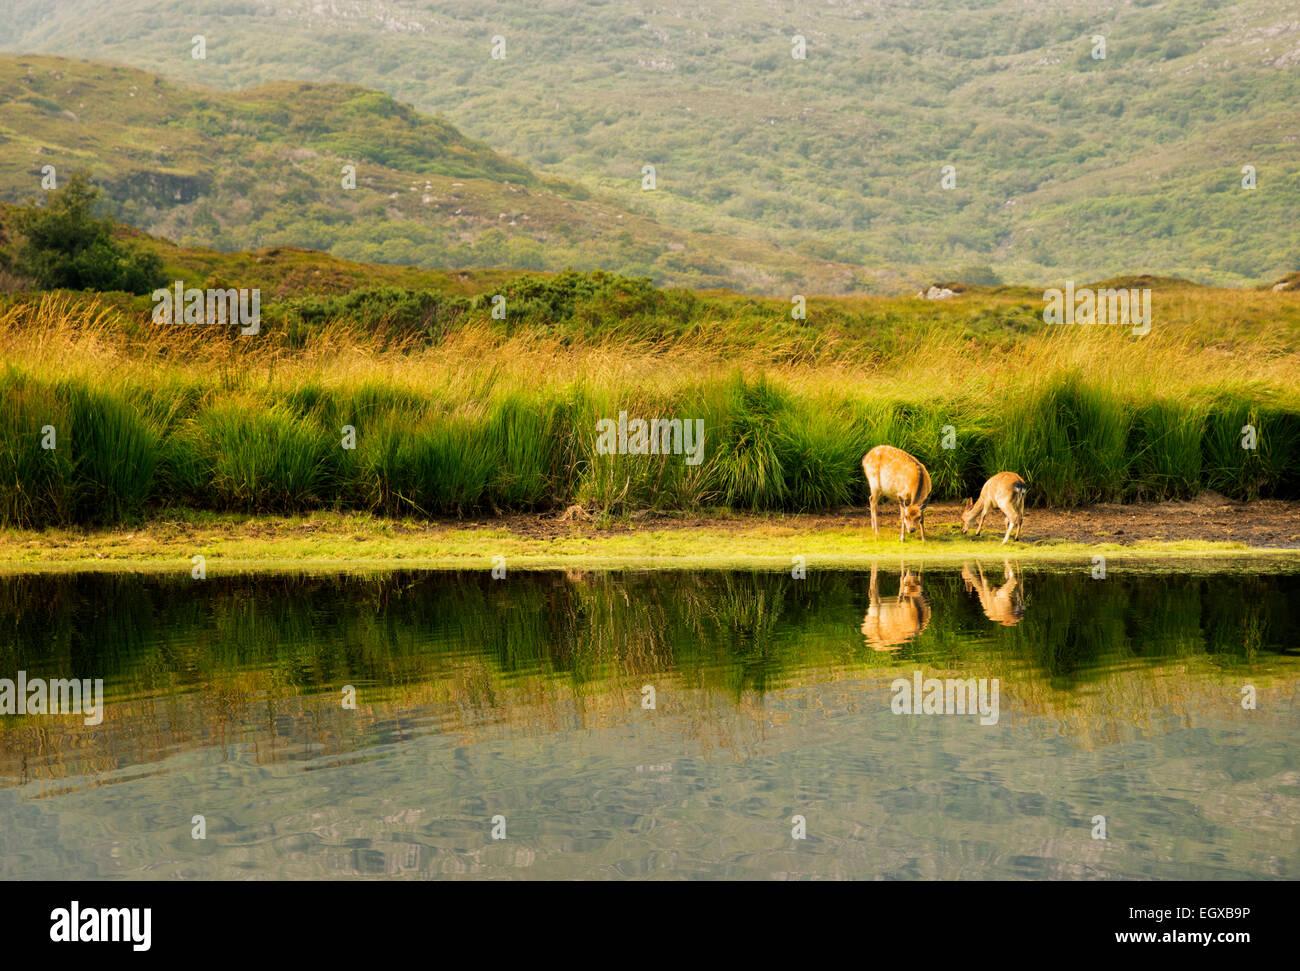 Sika Deer on shore of Lakes of Killarney, Killarney National Park, Ireland - Stock Image